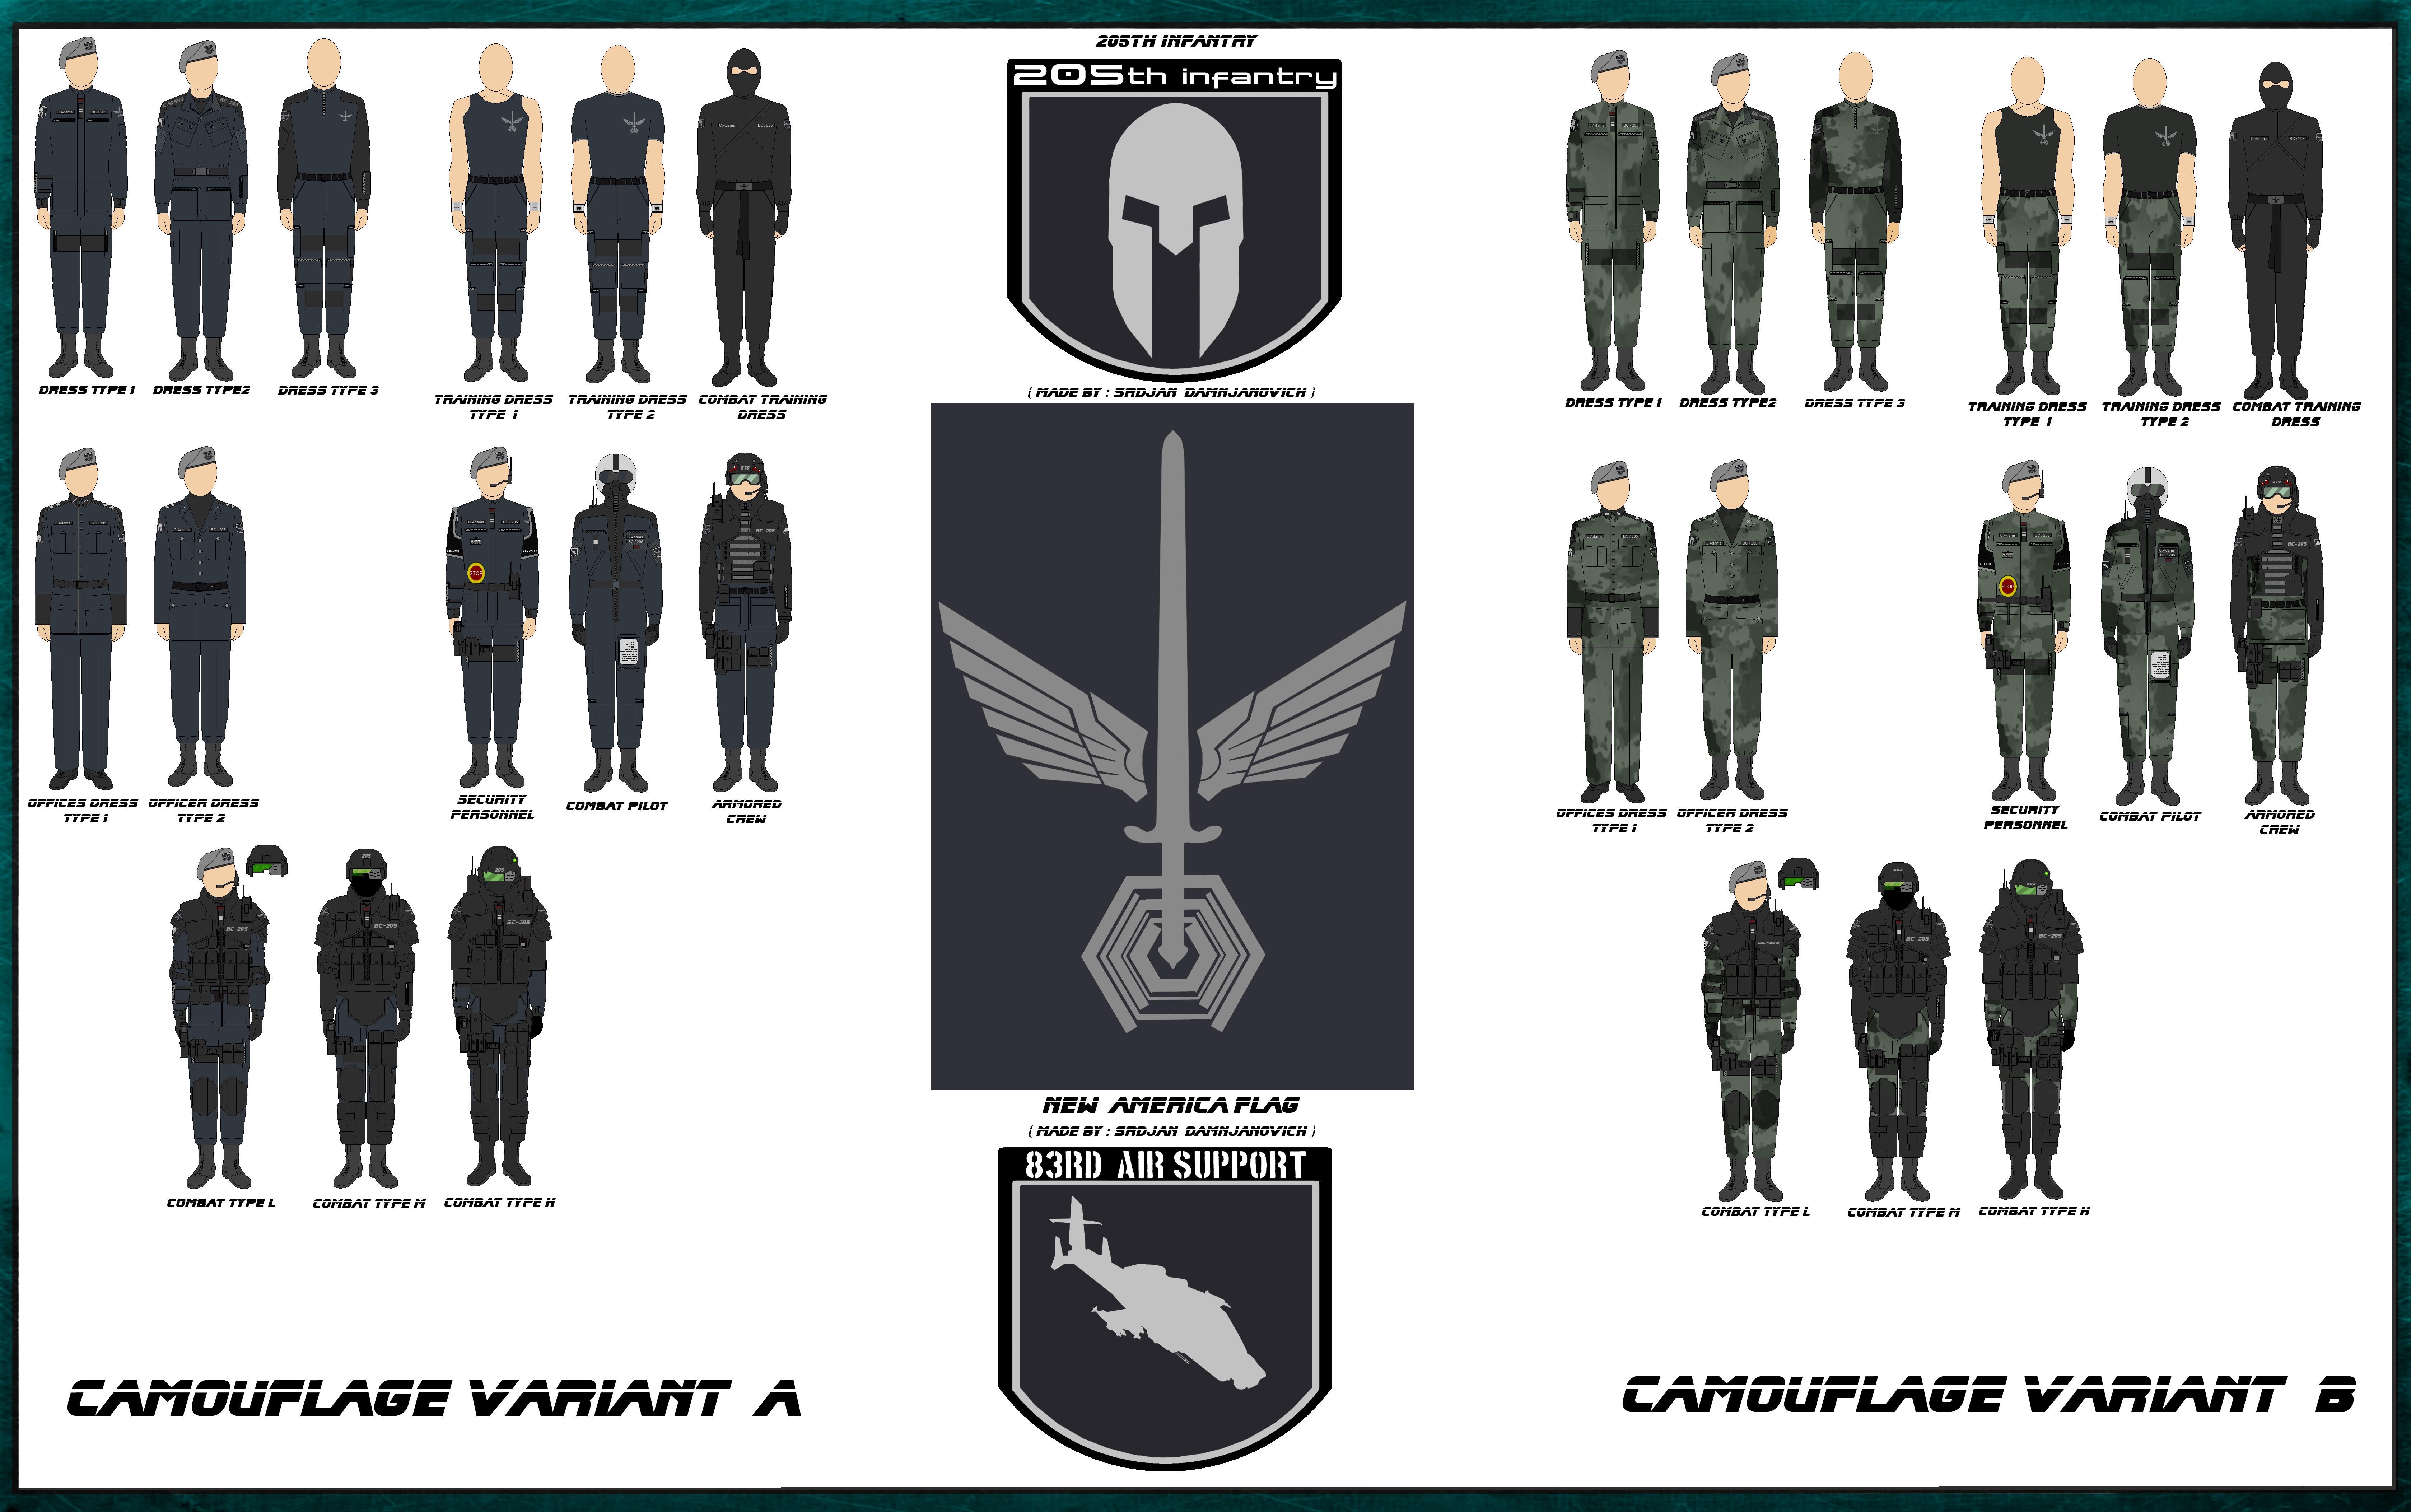 New Army Dress Uniform 2014 The system uniform typ...